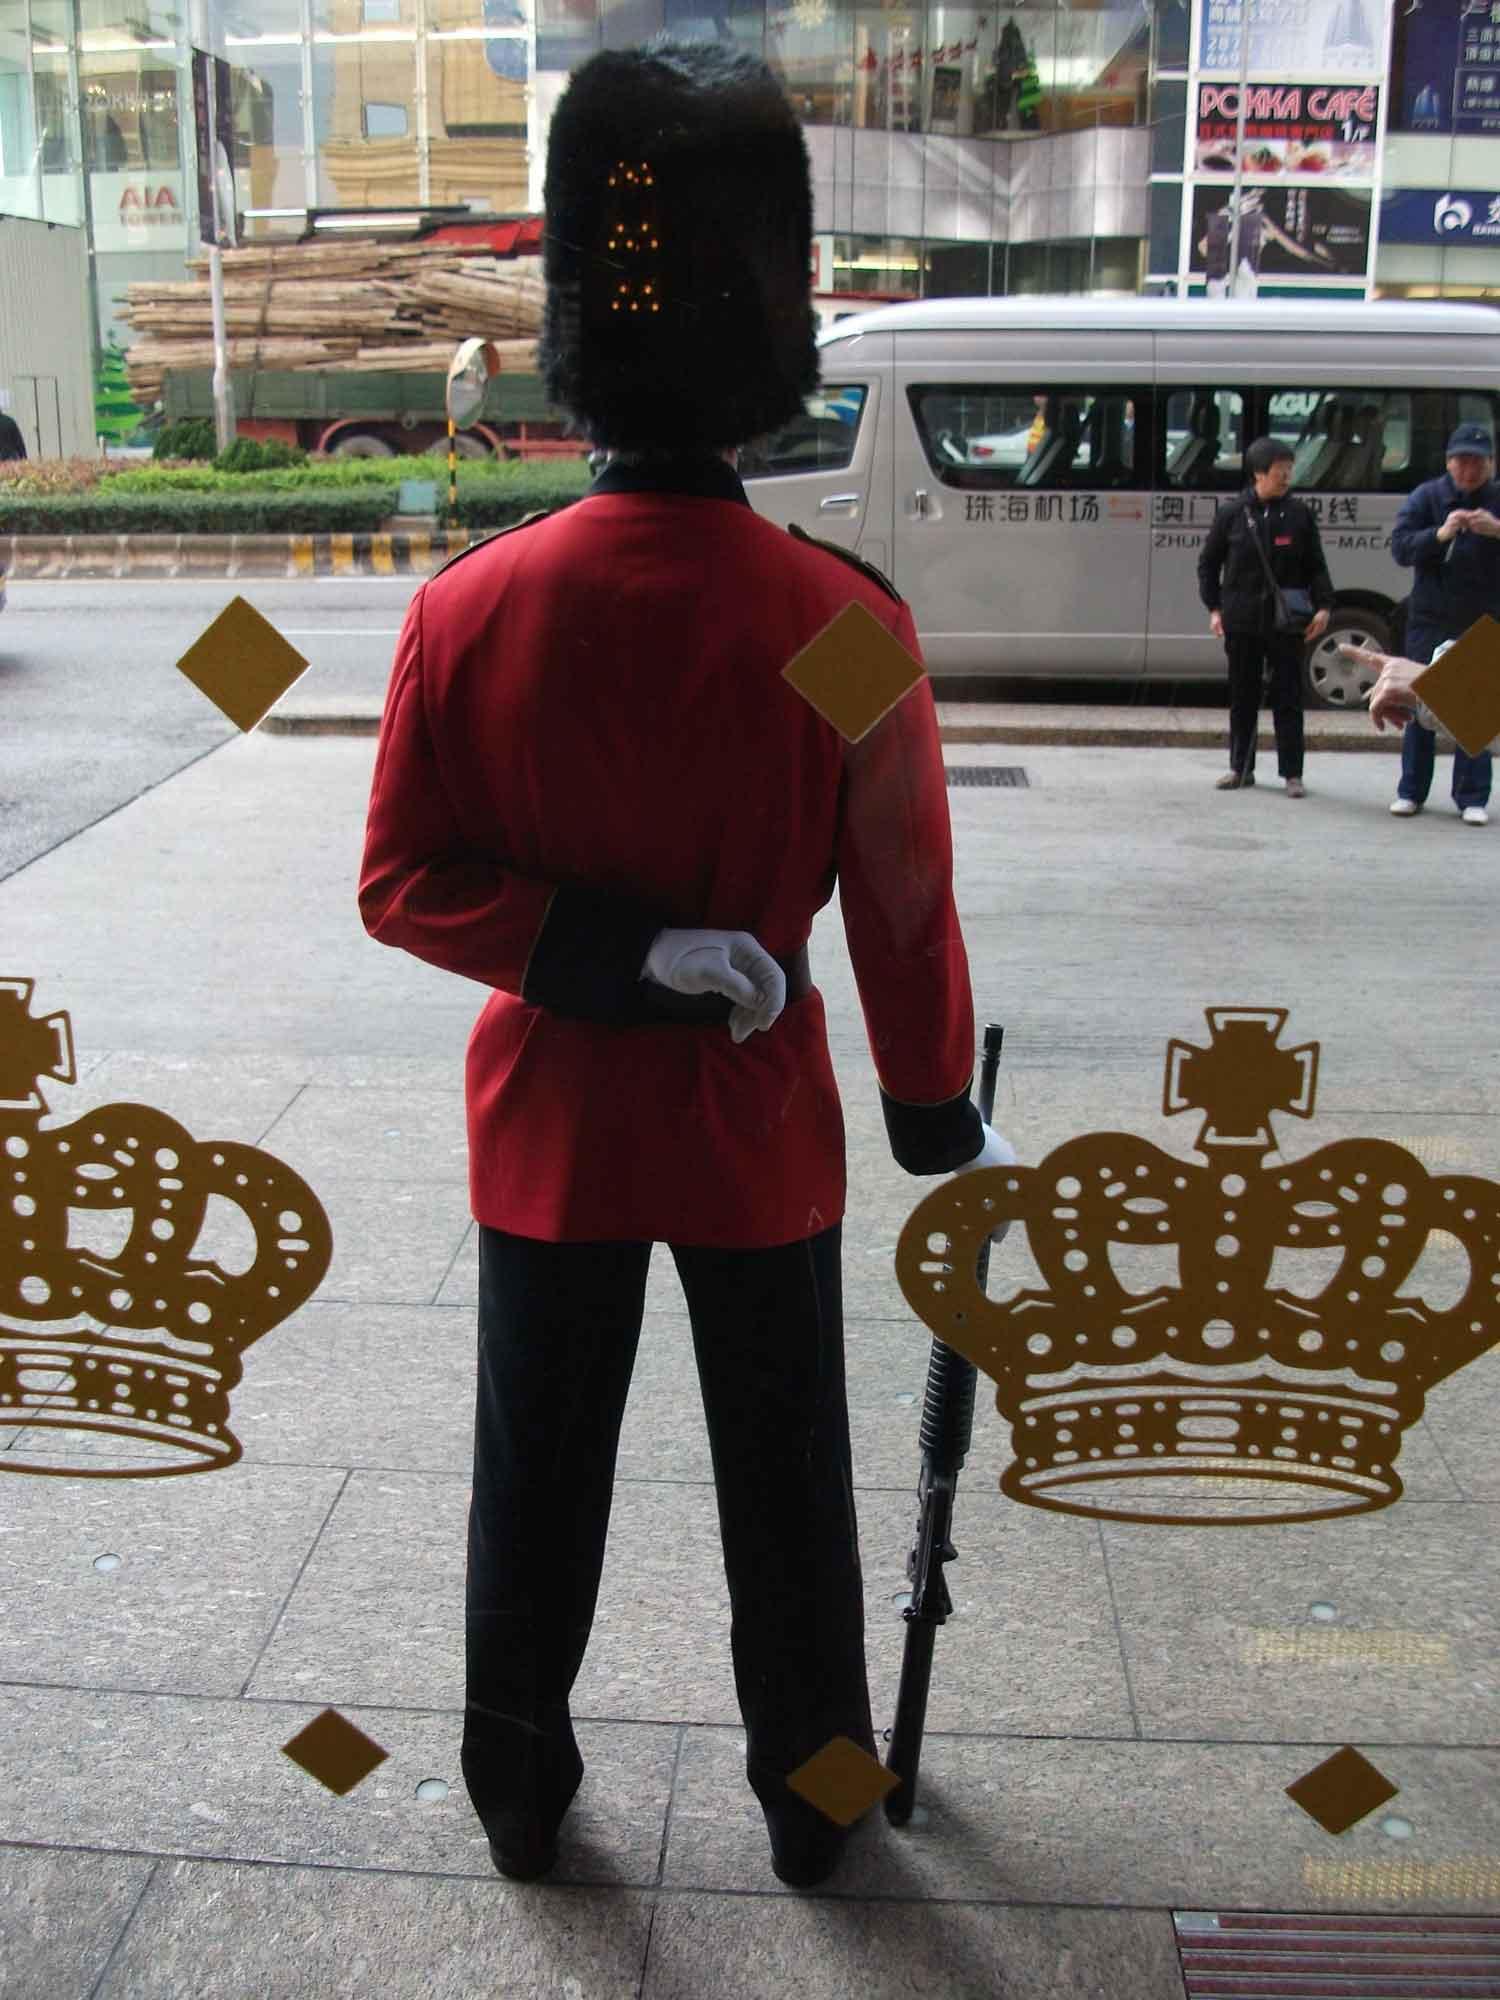 Grand Emperor Hotel Buckingham Palace guard back